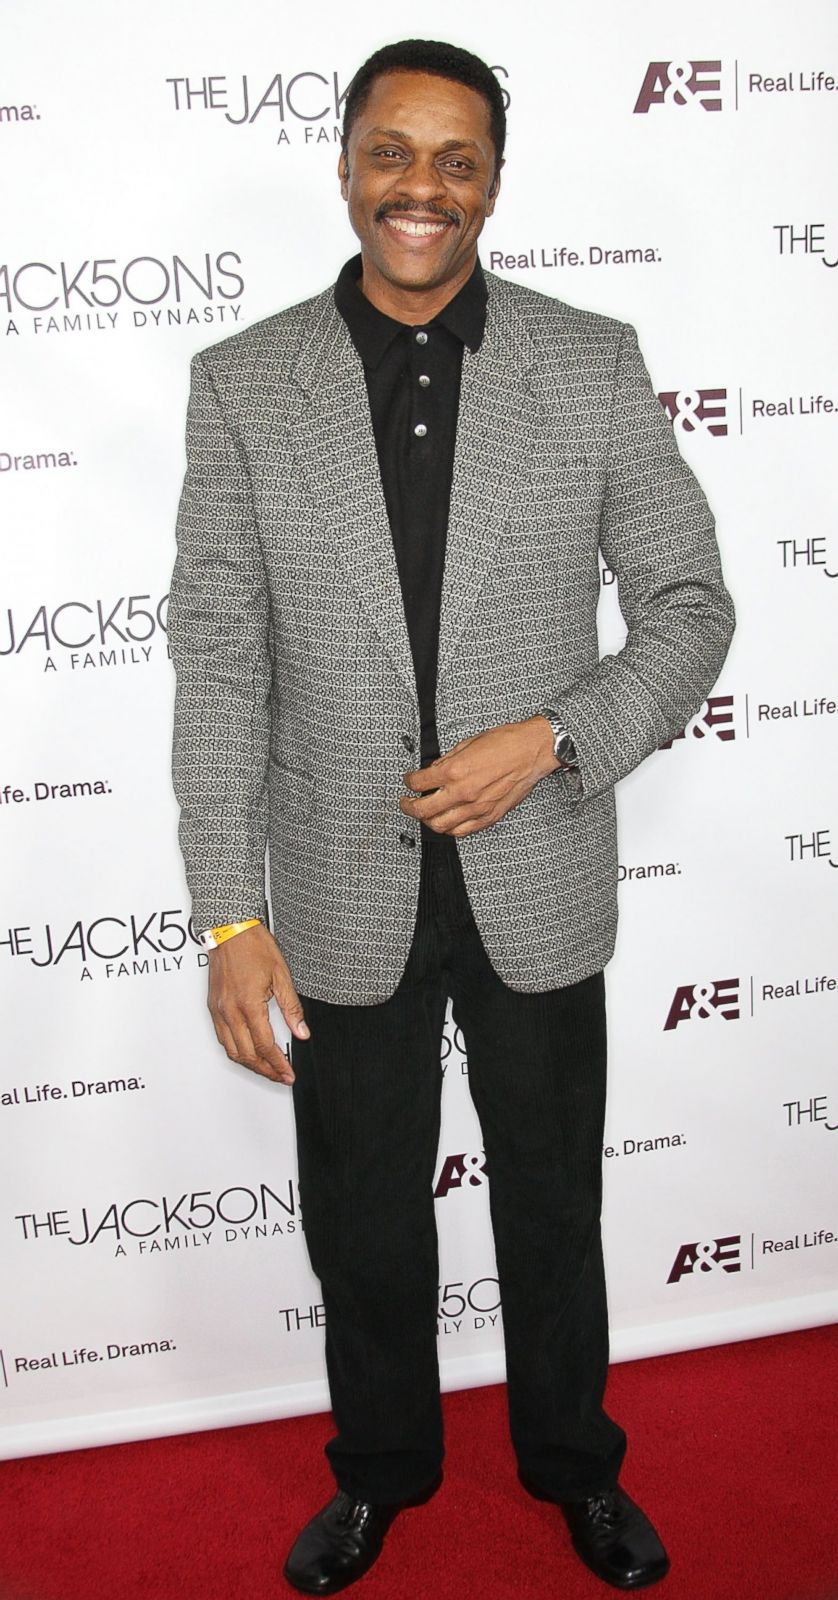 Lawrence Hilton Jacobs 2015